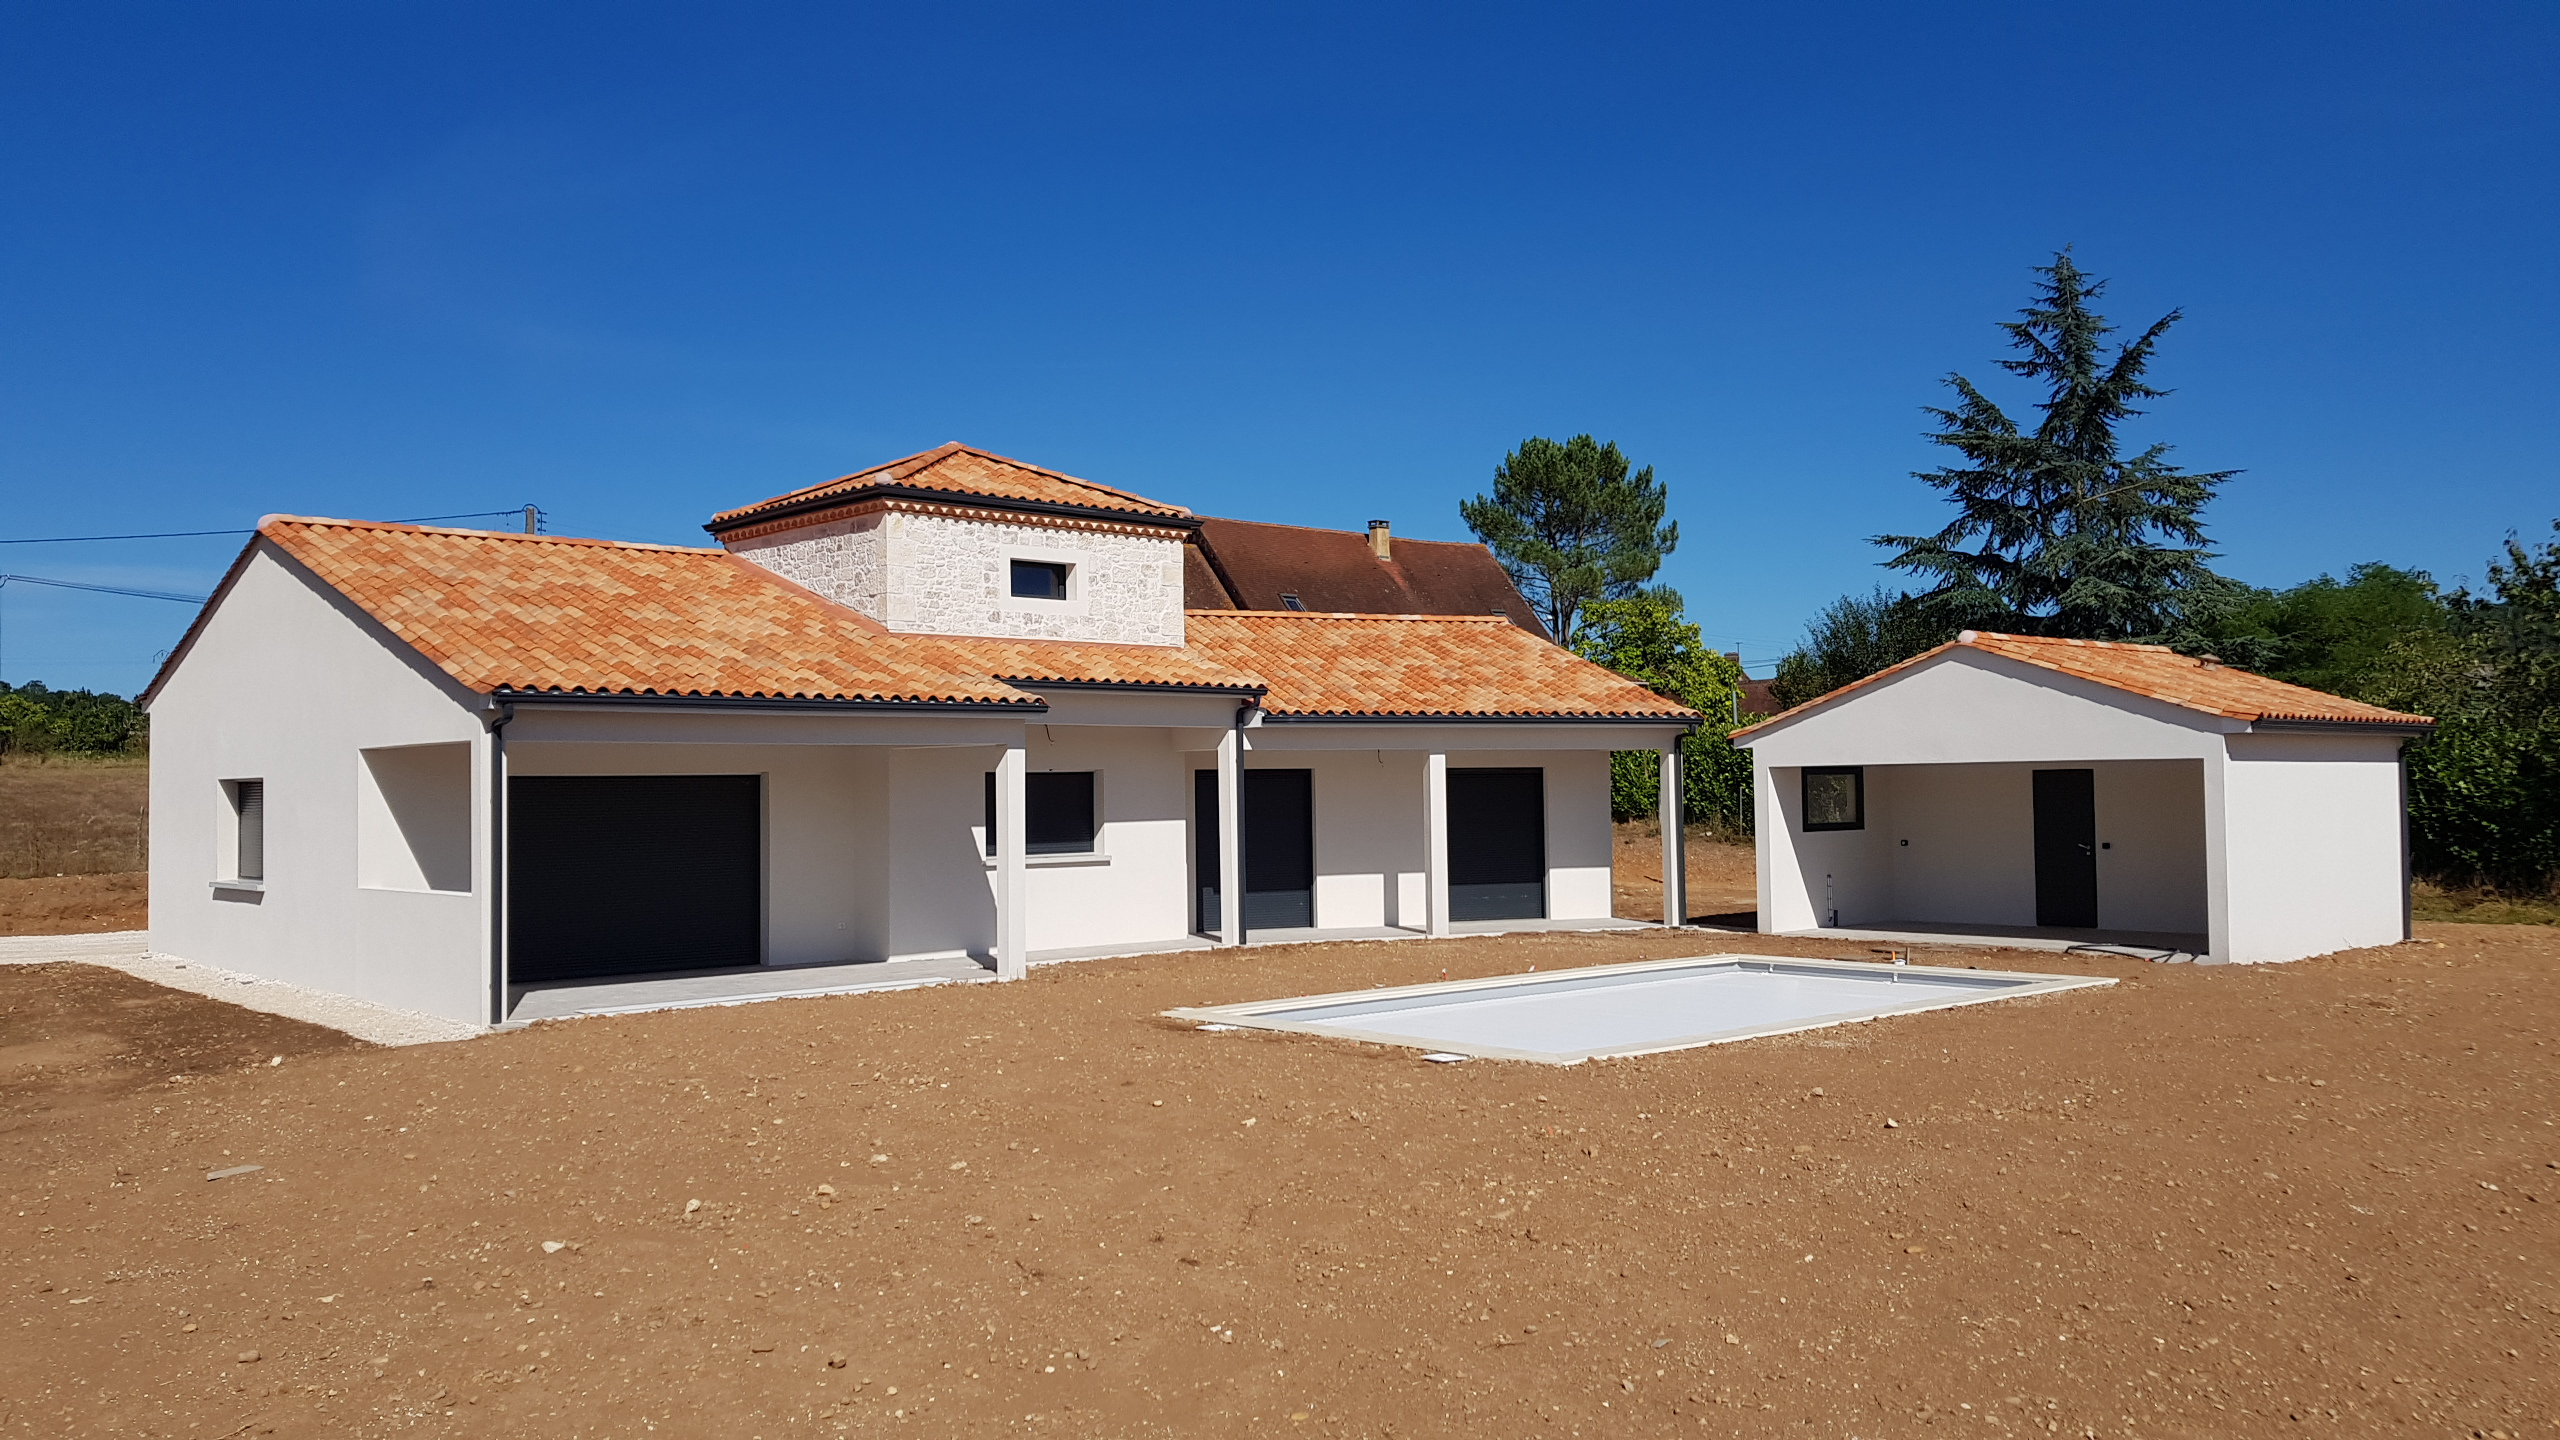 Maison, neuf, construction, anthracite, tour, Périgord, moderne